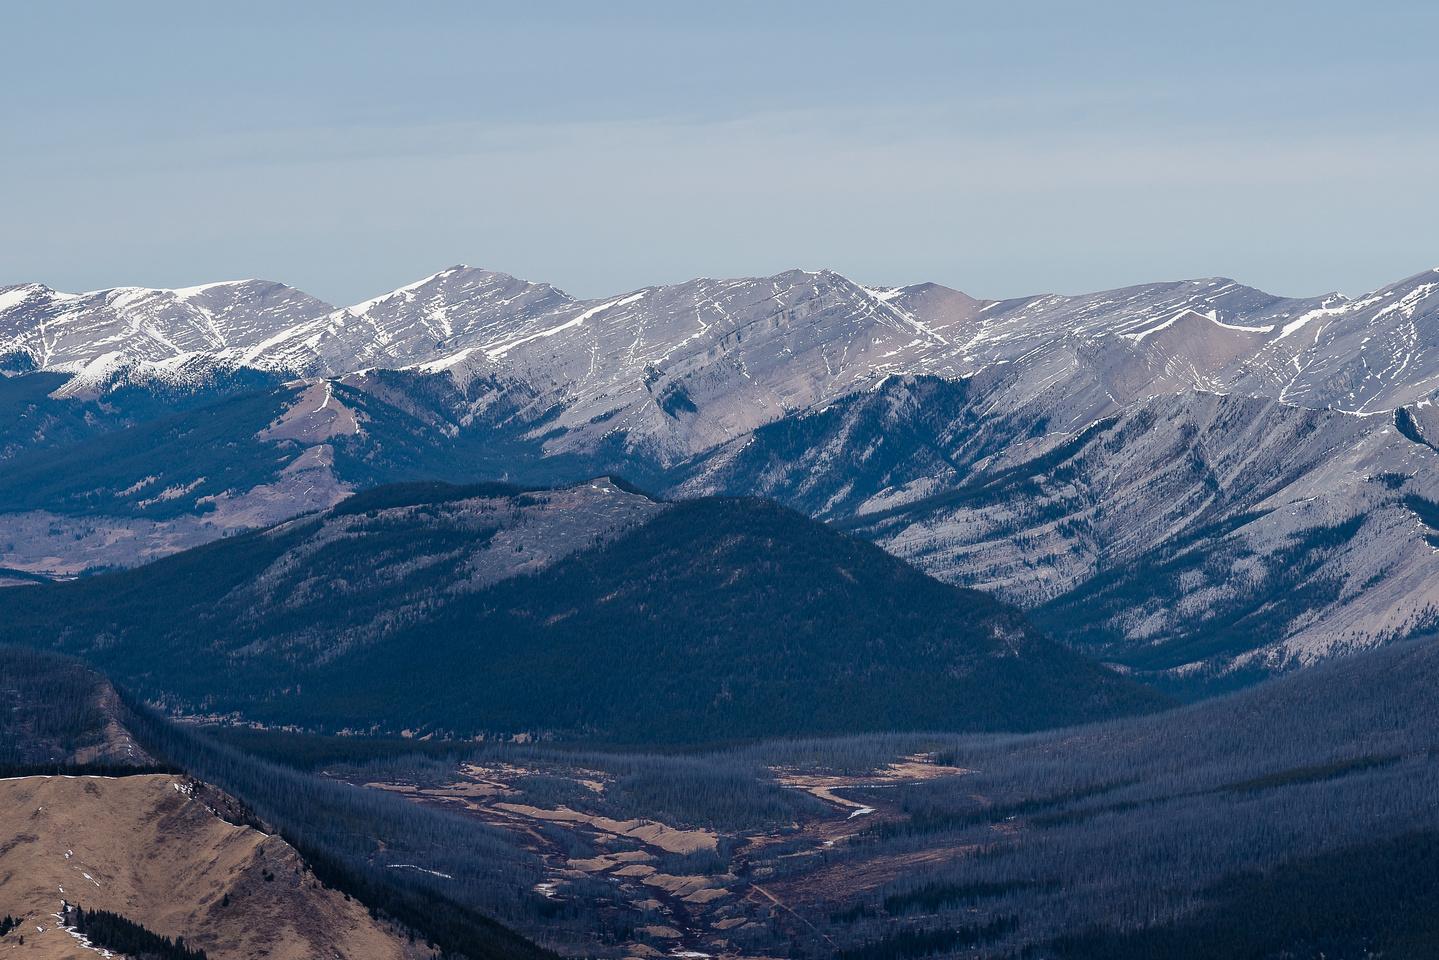 Views over Labyrinth Peak to Evangeline and Poplar.